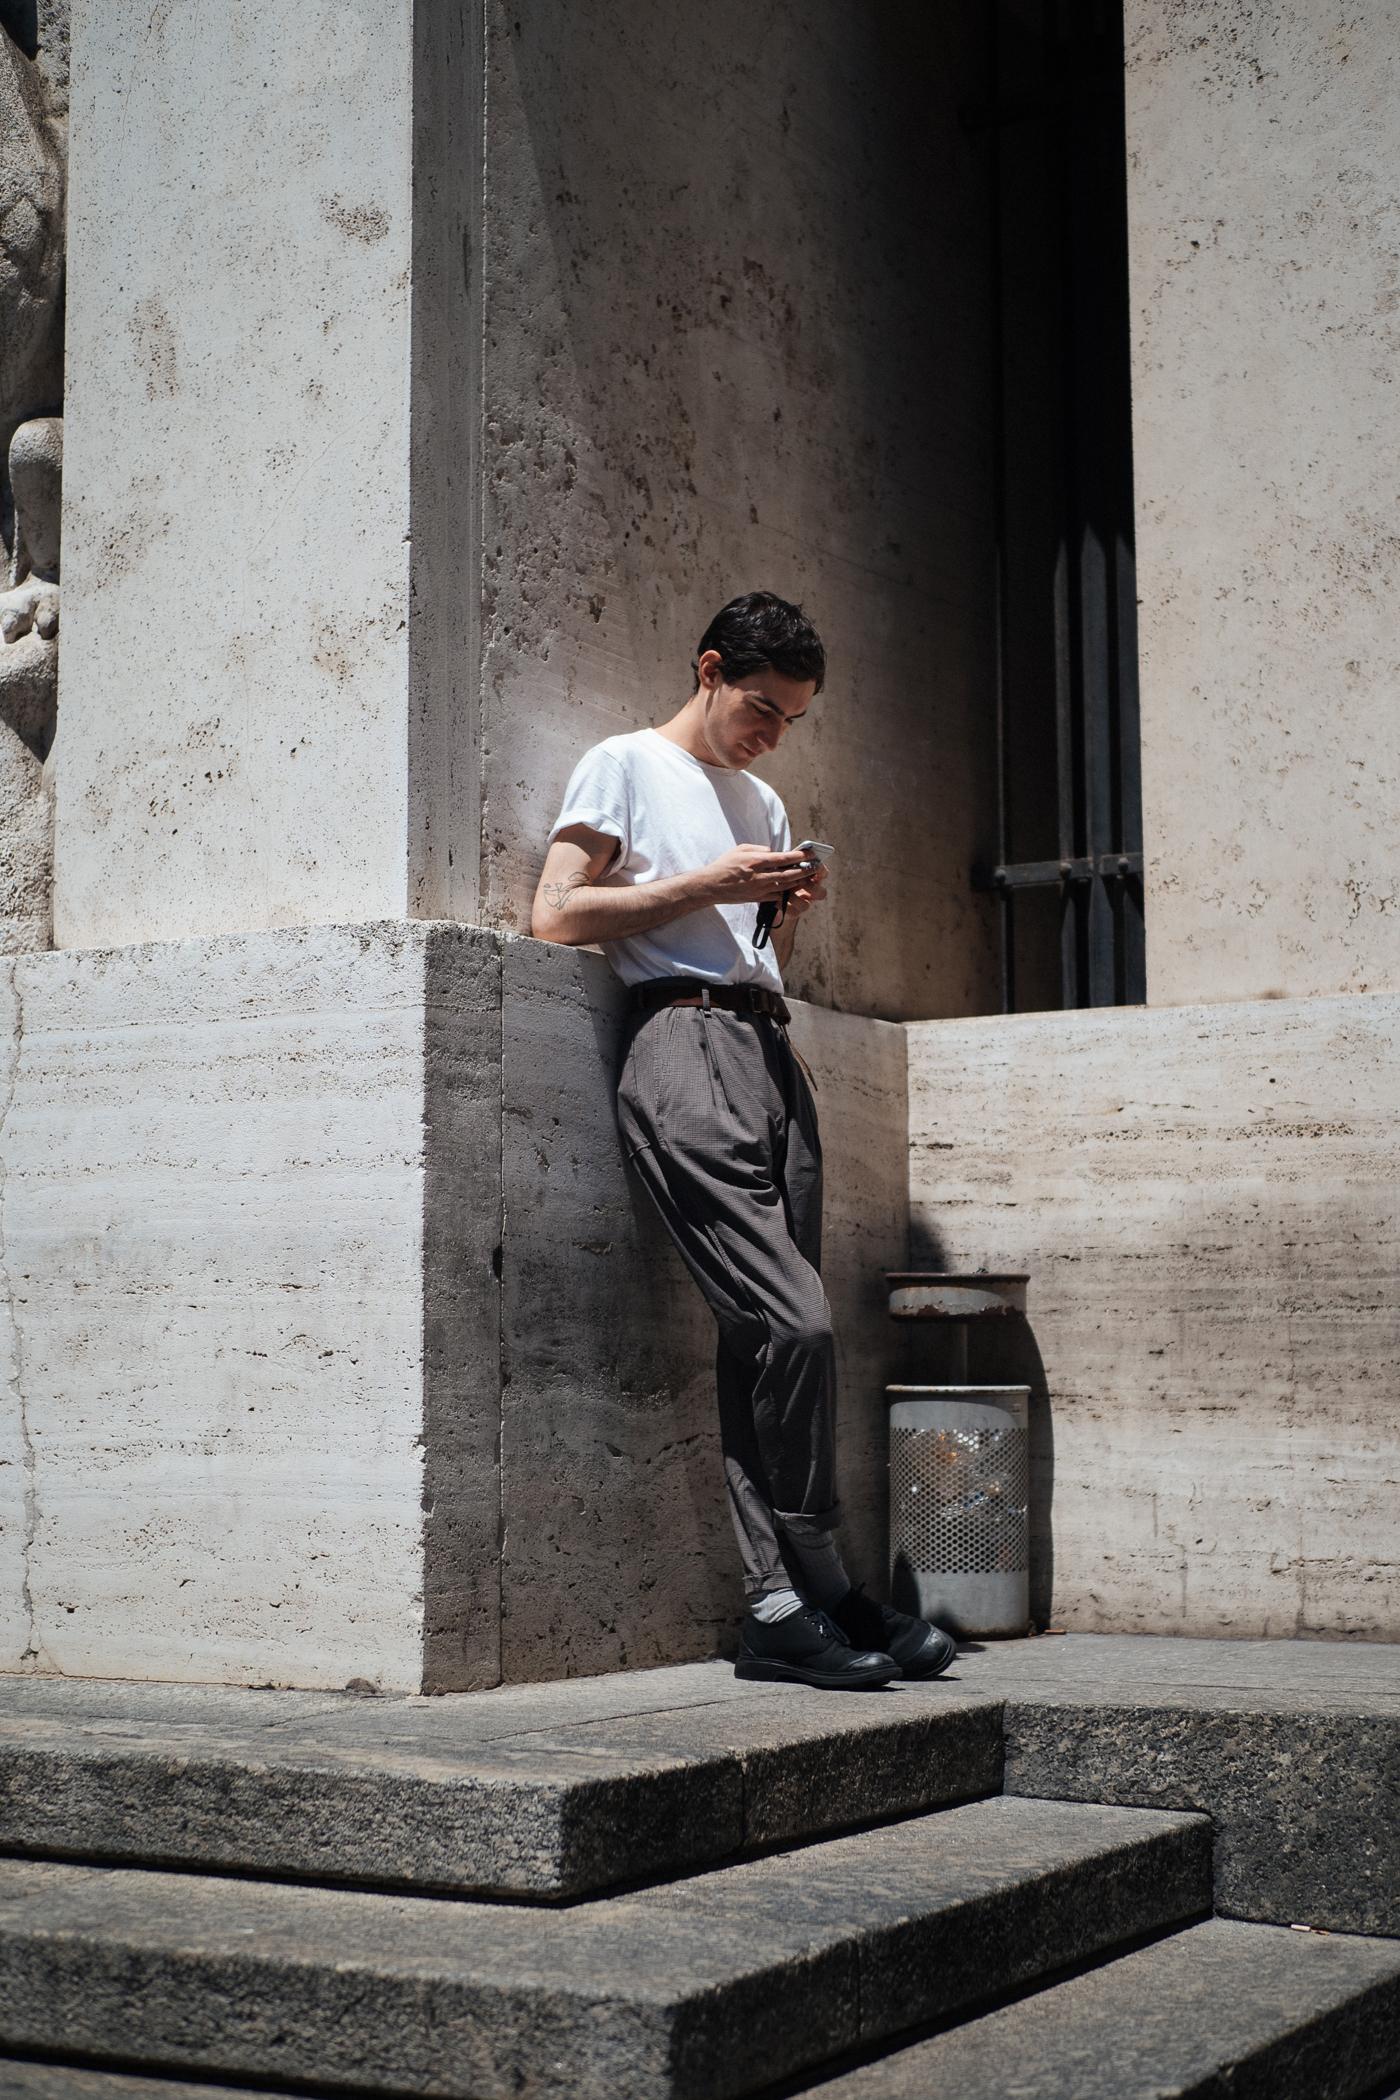 Steps at Milano Moda Uomo, captured on my  OM-D E-M1 Mark II.